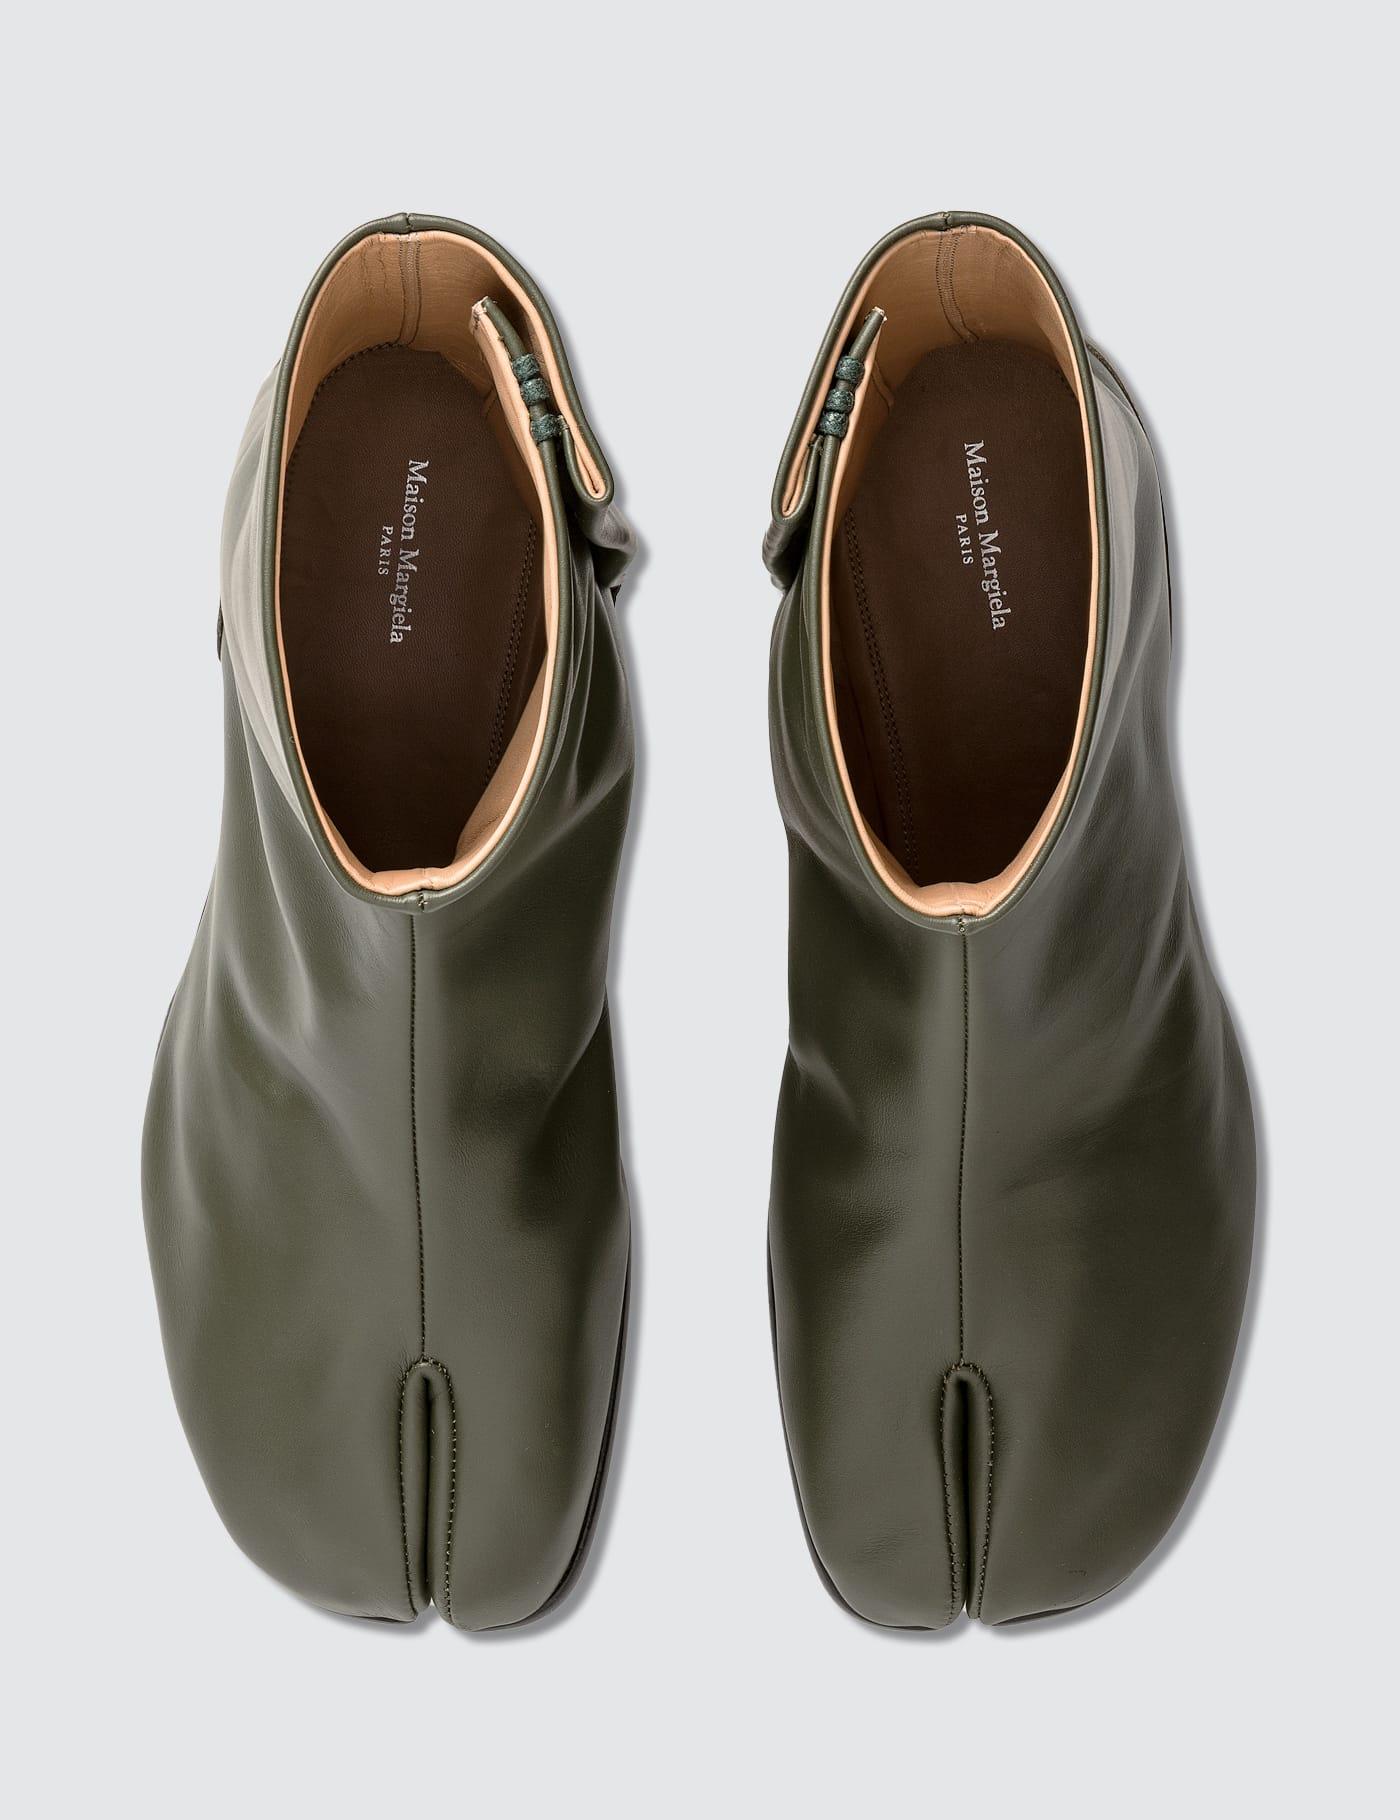 Maison Margiela - Tabi Leather Ankle